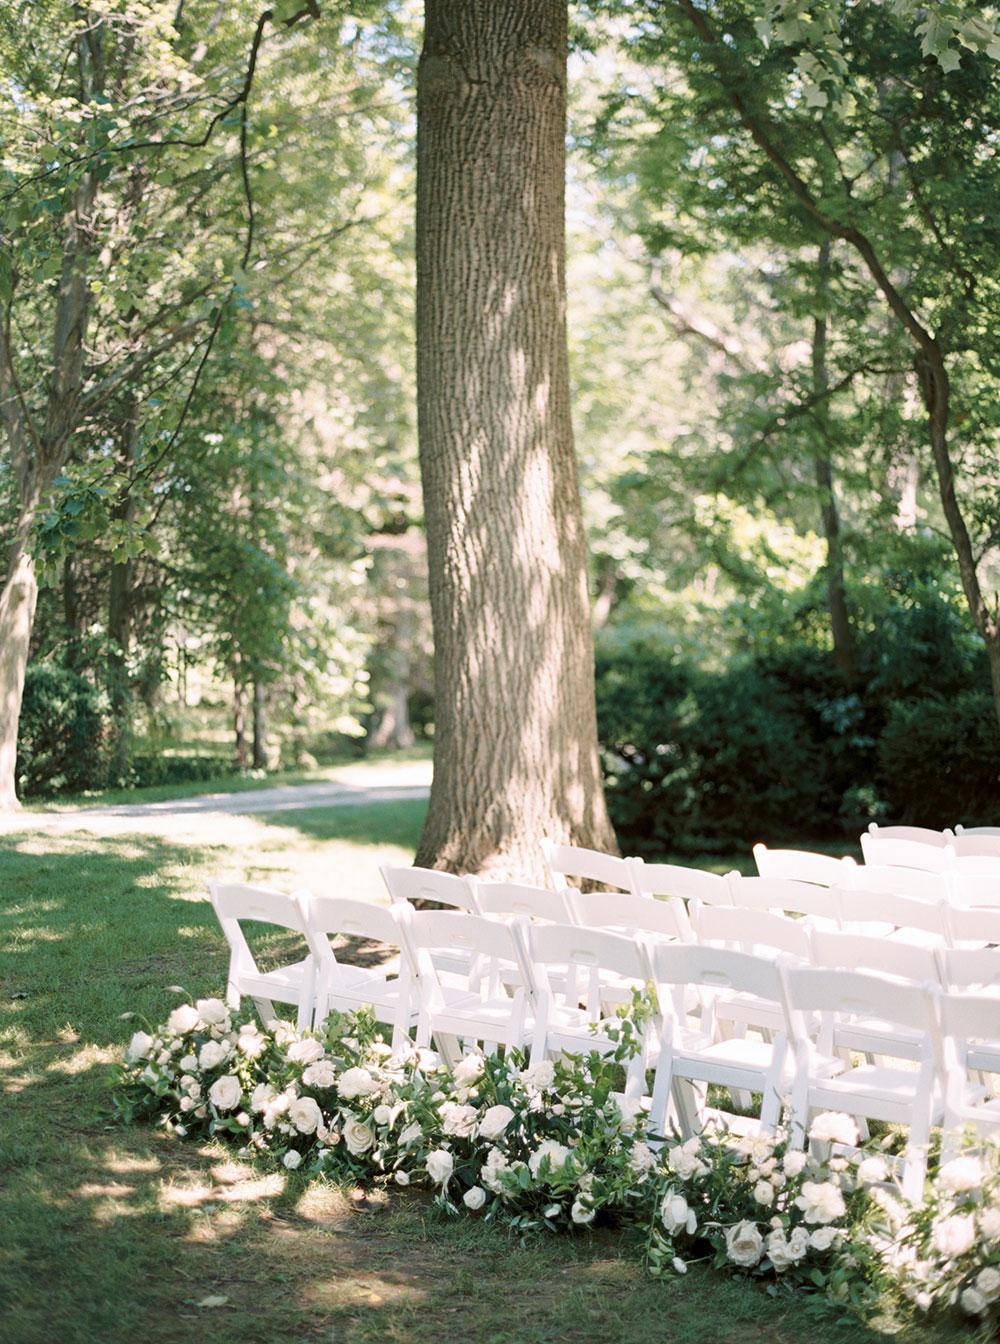 kurtz-orchards-wedding-gracewood-estate-niagara-on-the-lake-photo-by-katie-nicolle-photography-0020.JPG